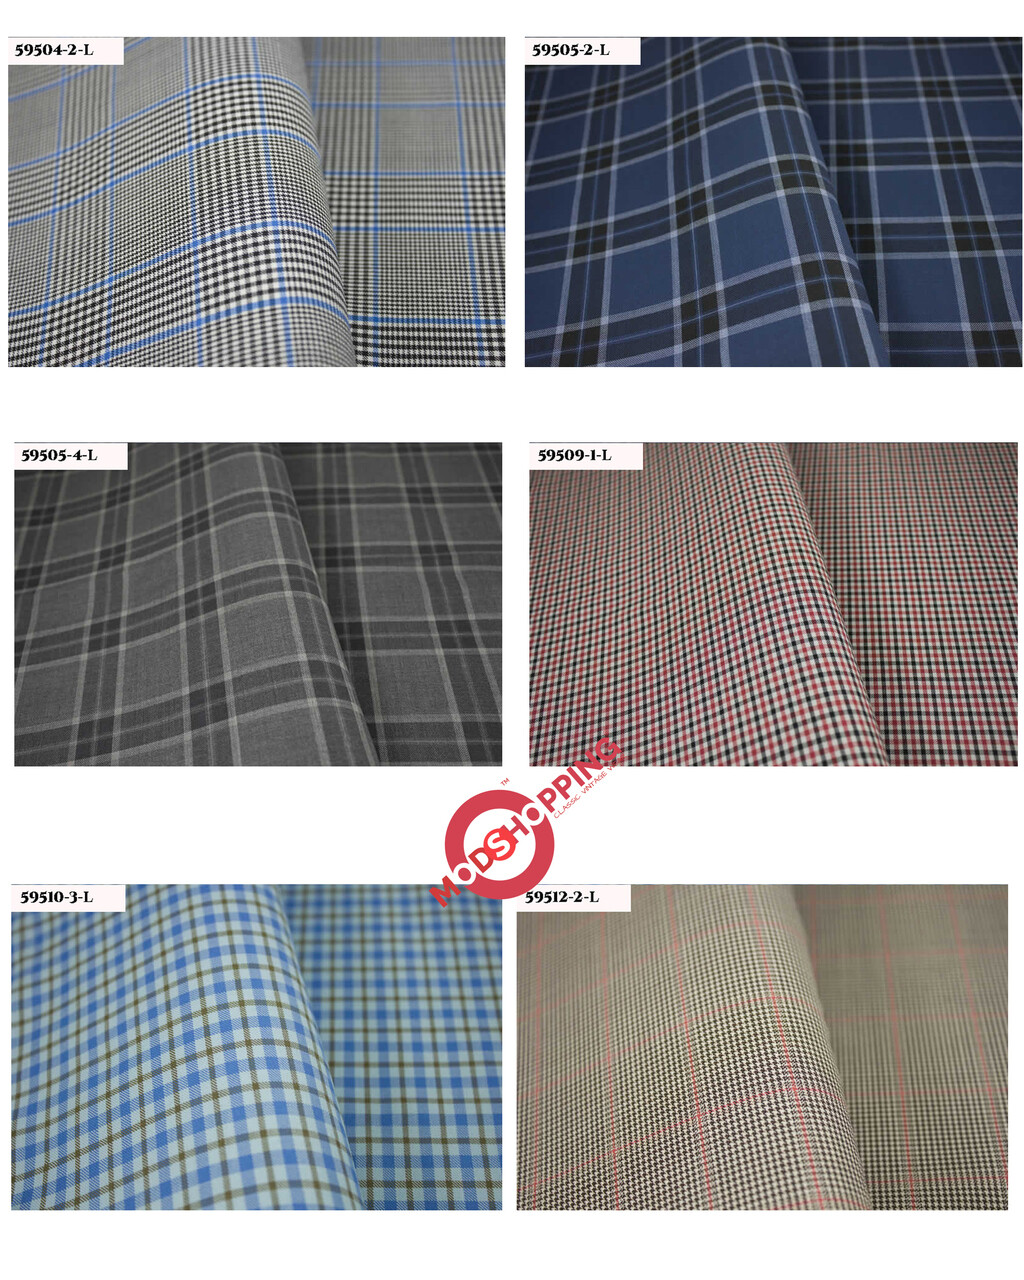 Mod 60s Style Multi-Color Gingham Check 3 Piece Suit